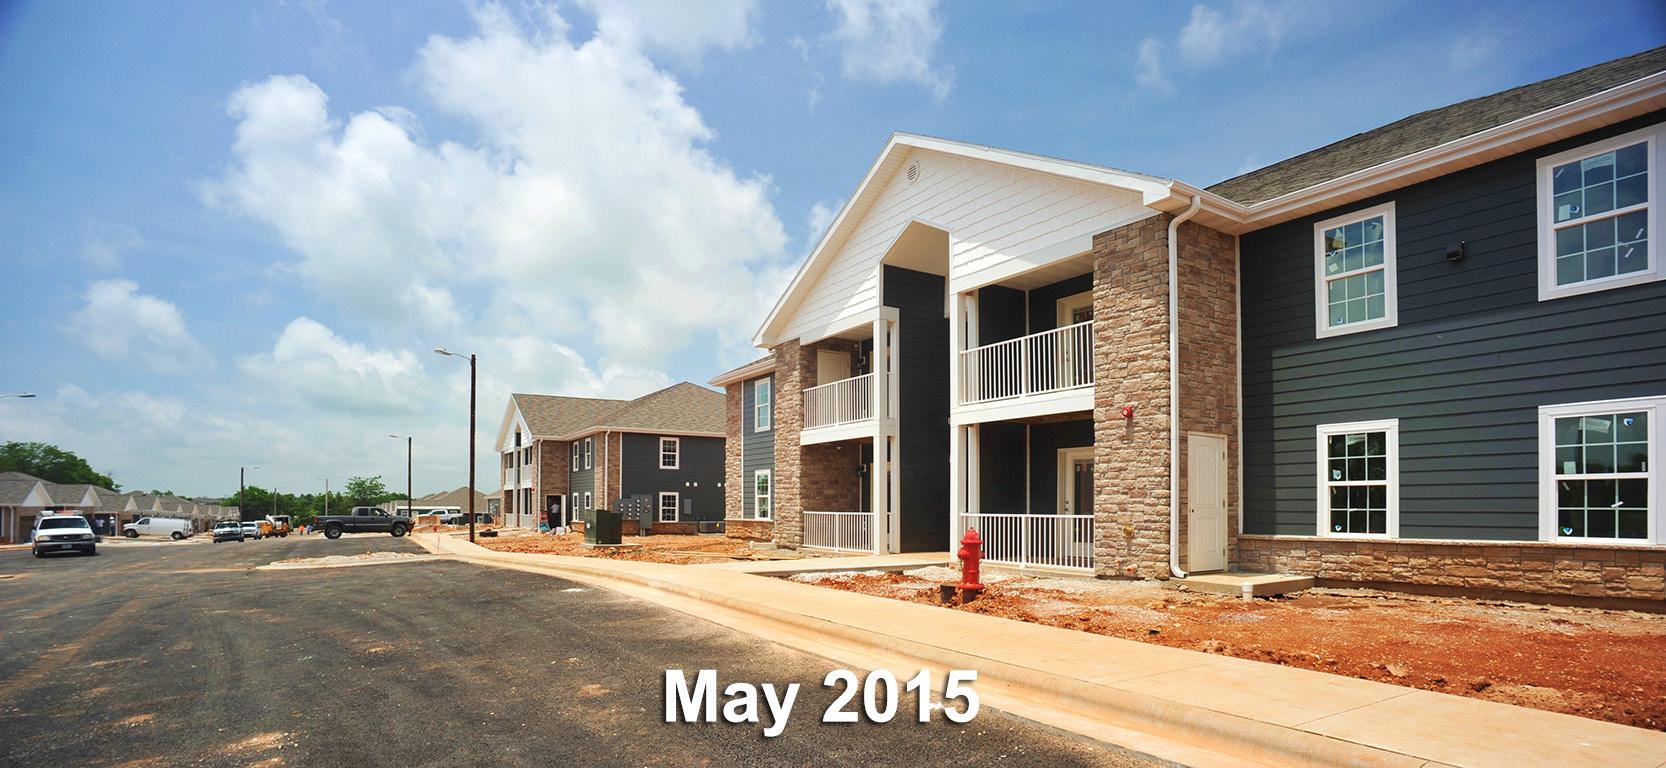 Affordable Housing Development : Hamilton properties corporation